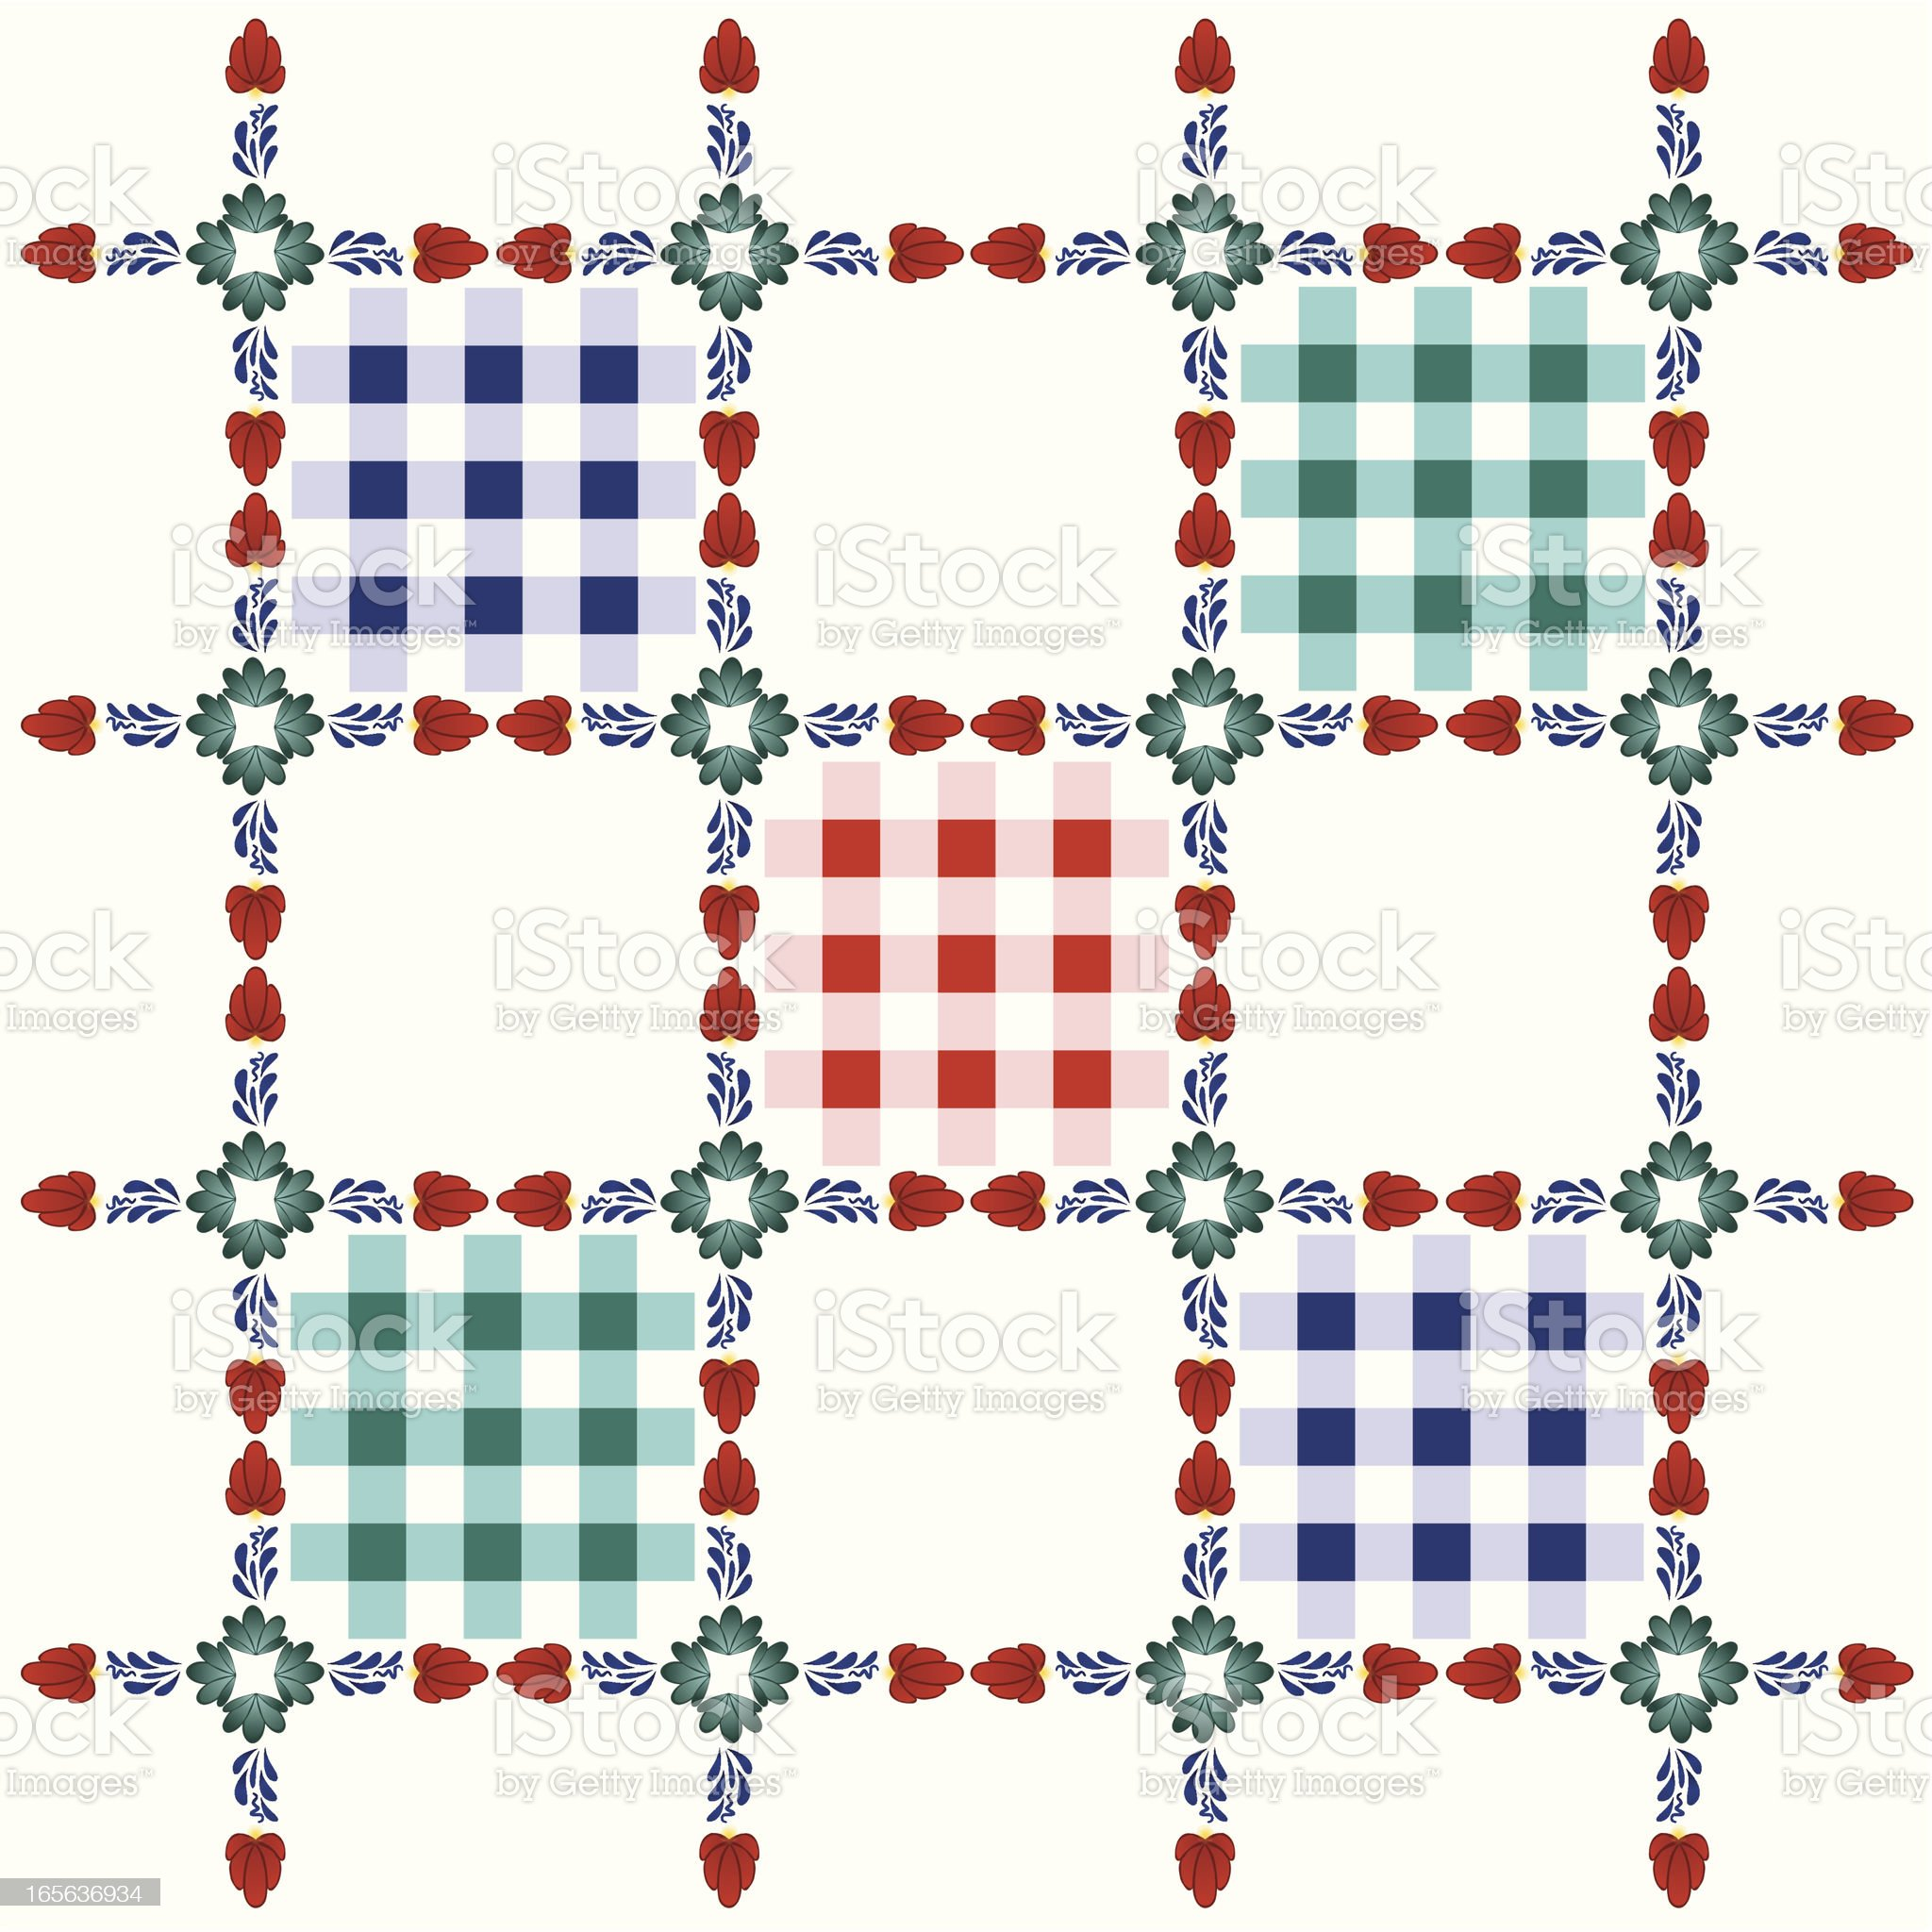 Boerenbont pattern royalty-free stock vector art